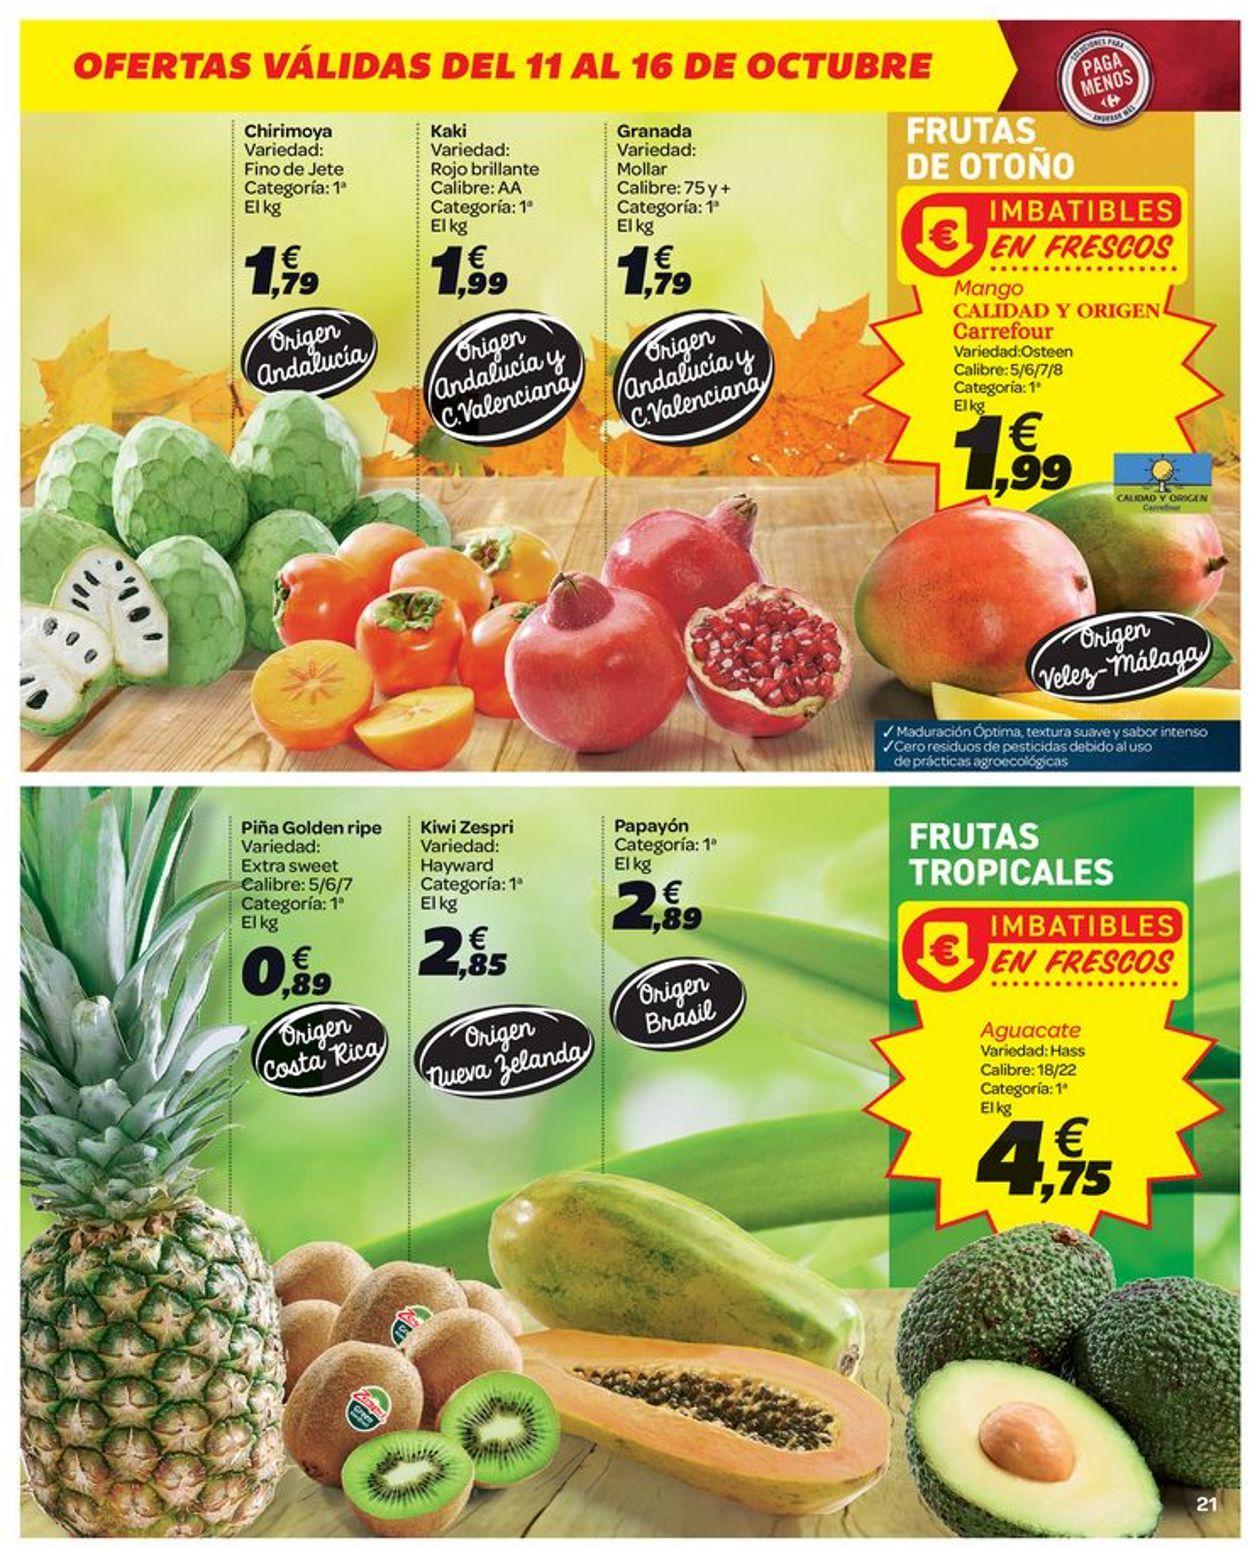 Carrefour Folleto - 11.10-23.10.2019 (Página 21)